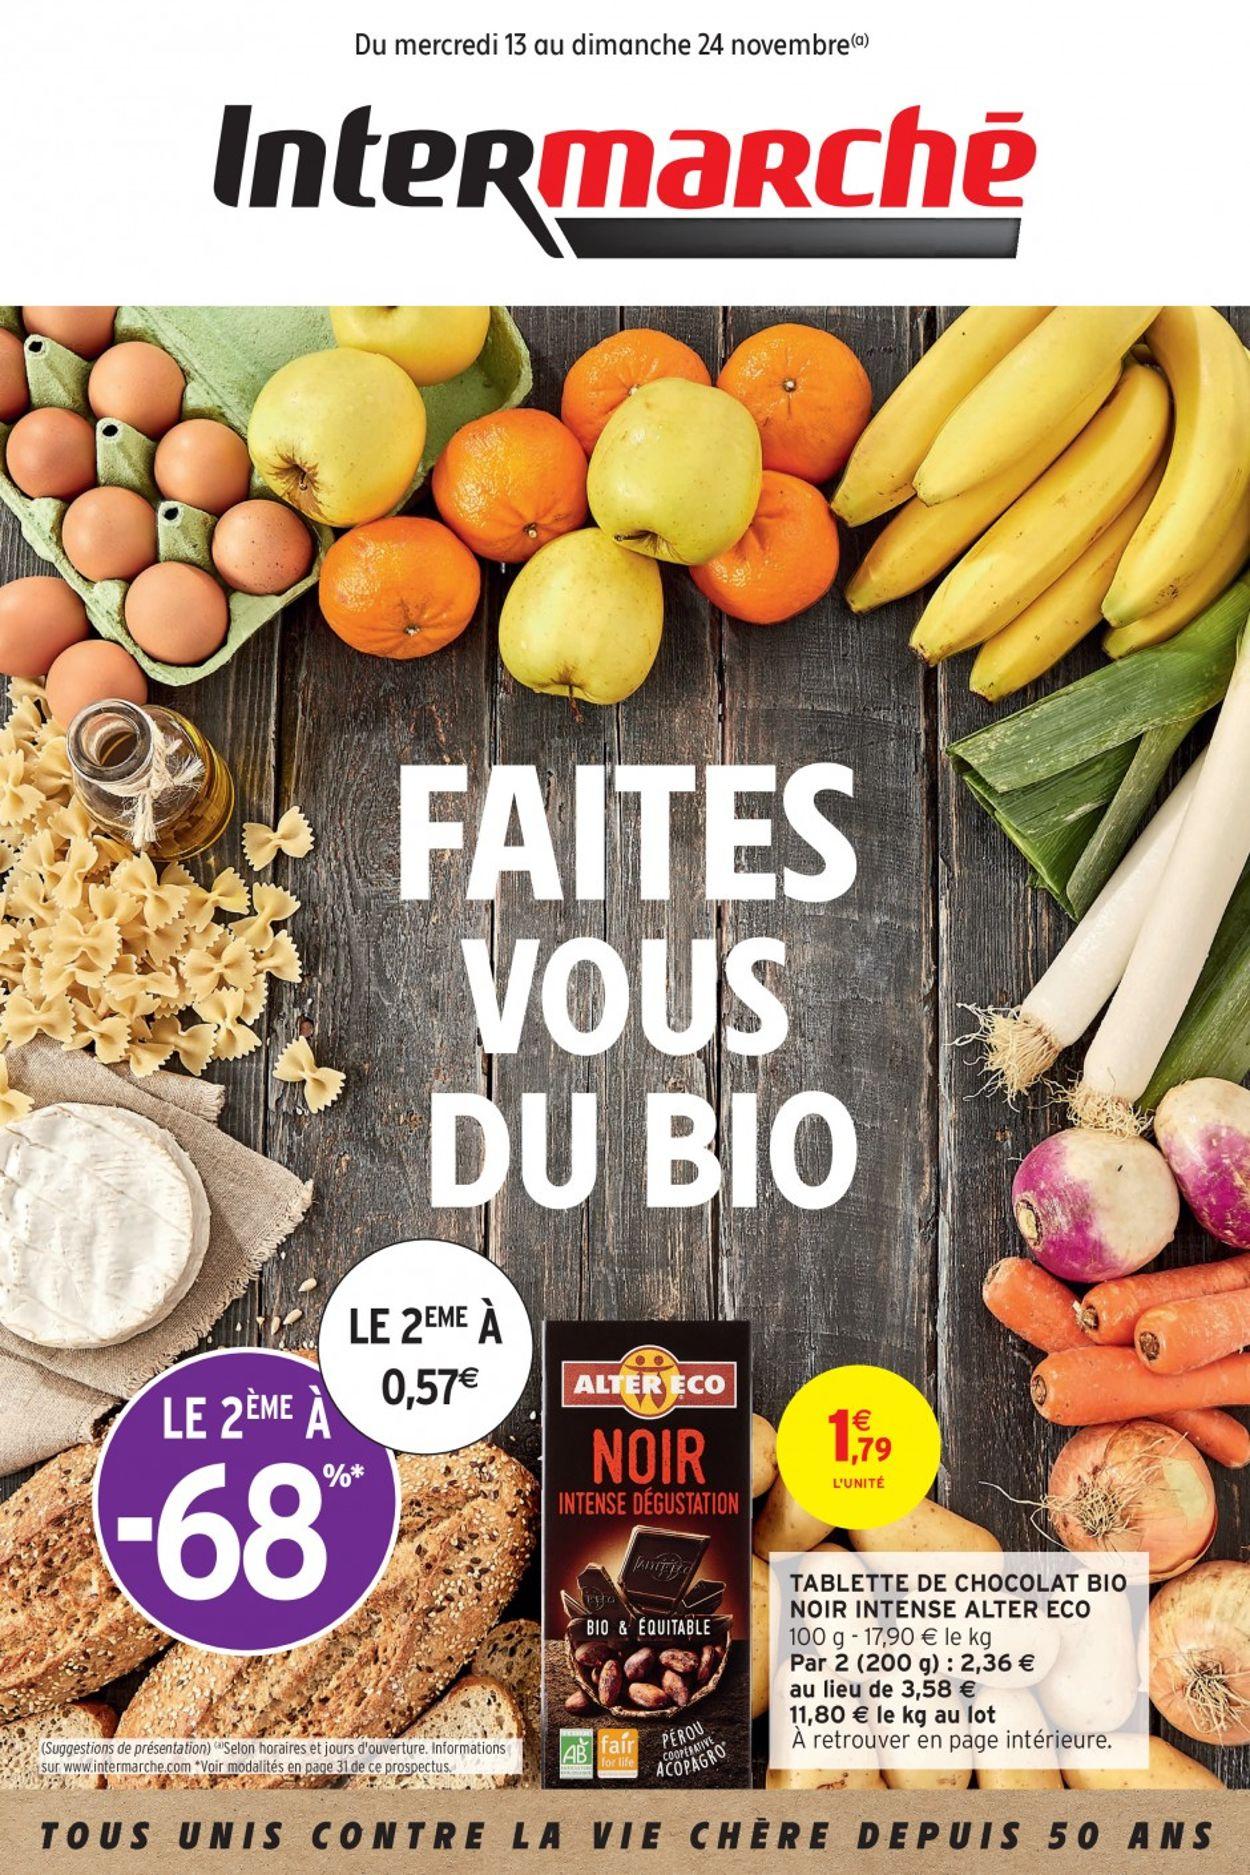 Intermarché Catalogue - 13.11-24.11.2019